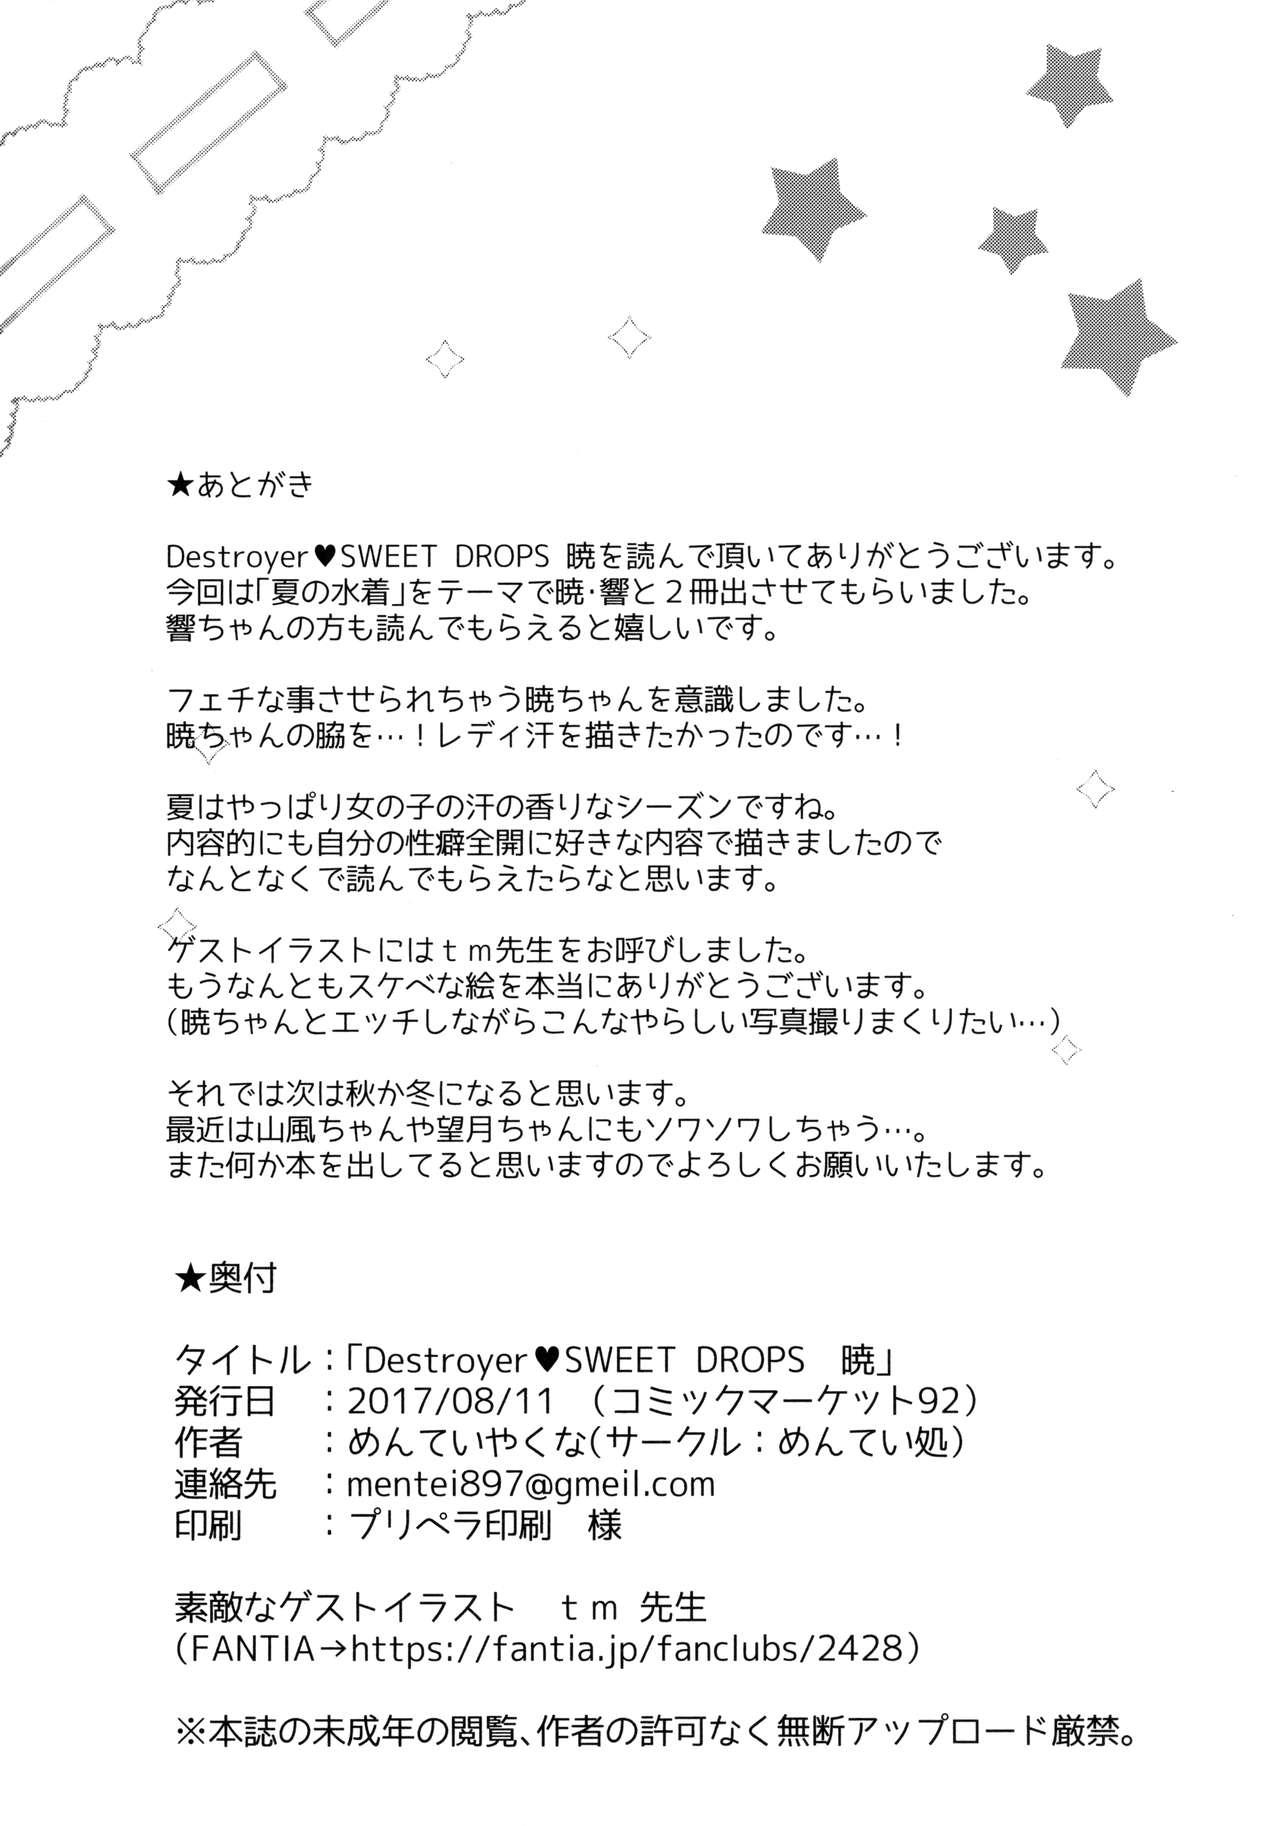 Destroyer SWEET DROPS Akatsuki 20